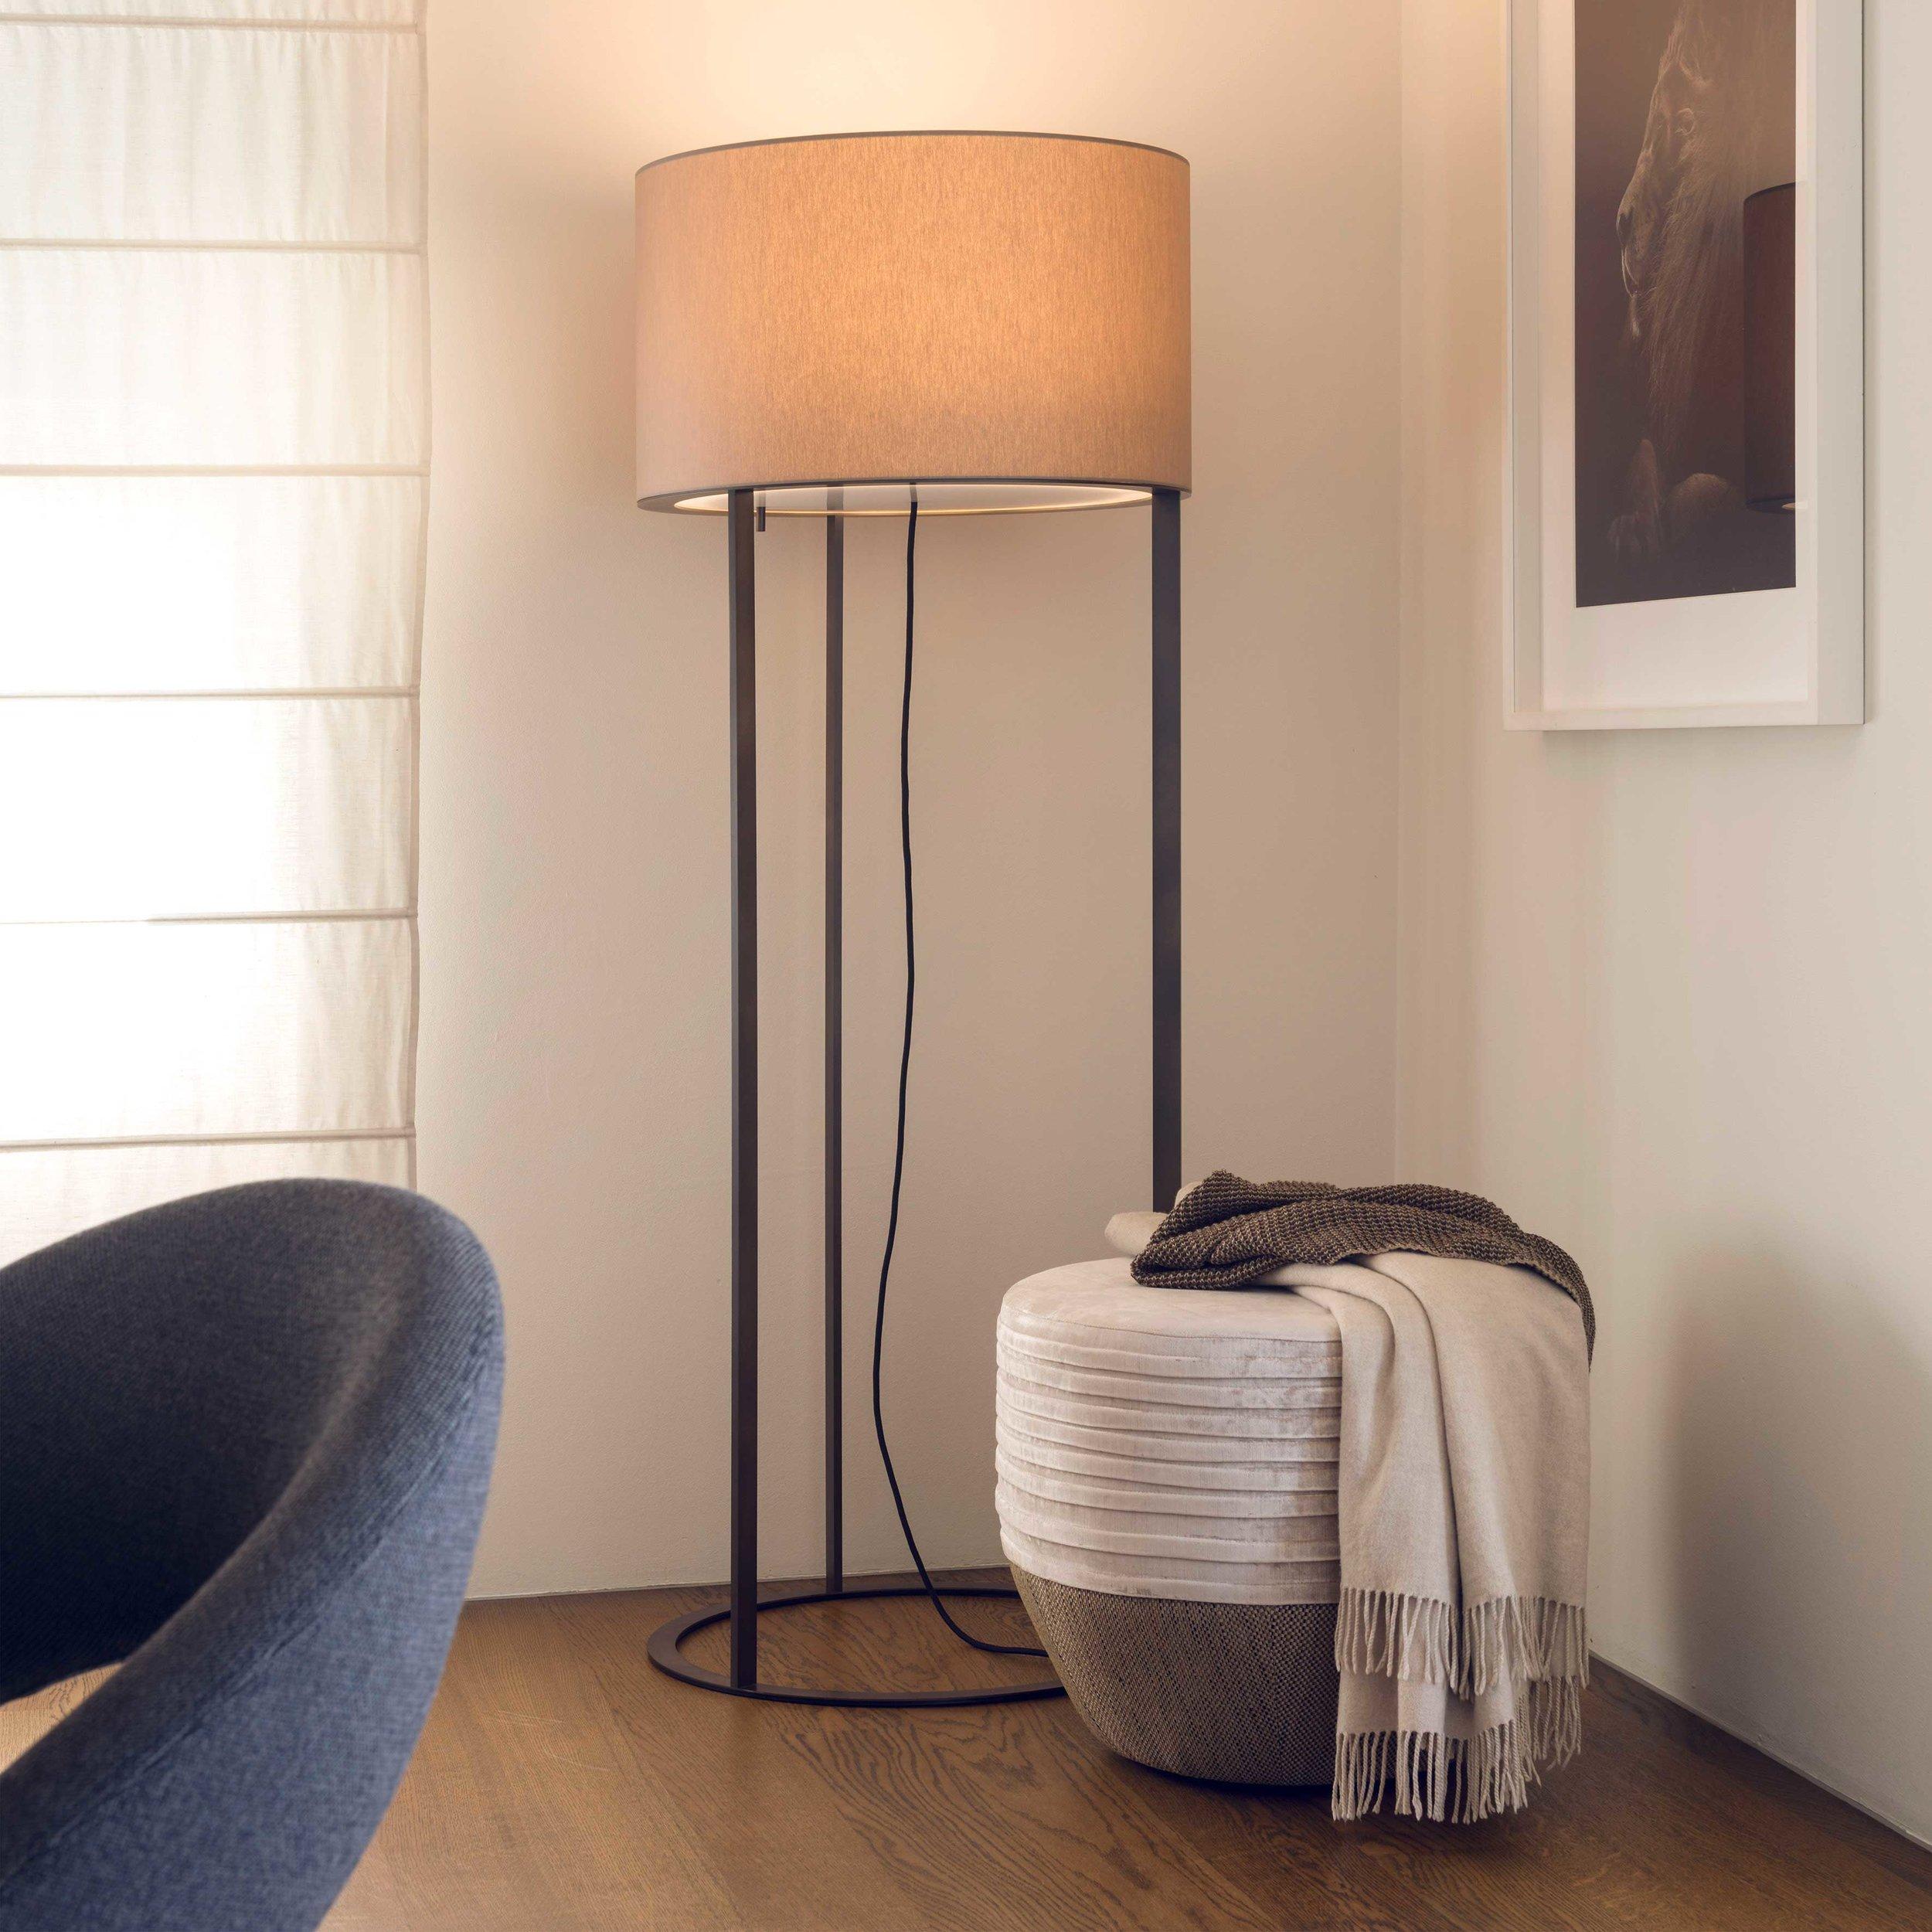 LOE_floor-lamp-by-Iria-Degen-Baulmann-Leuchten_02.jpg